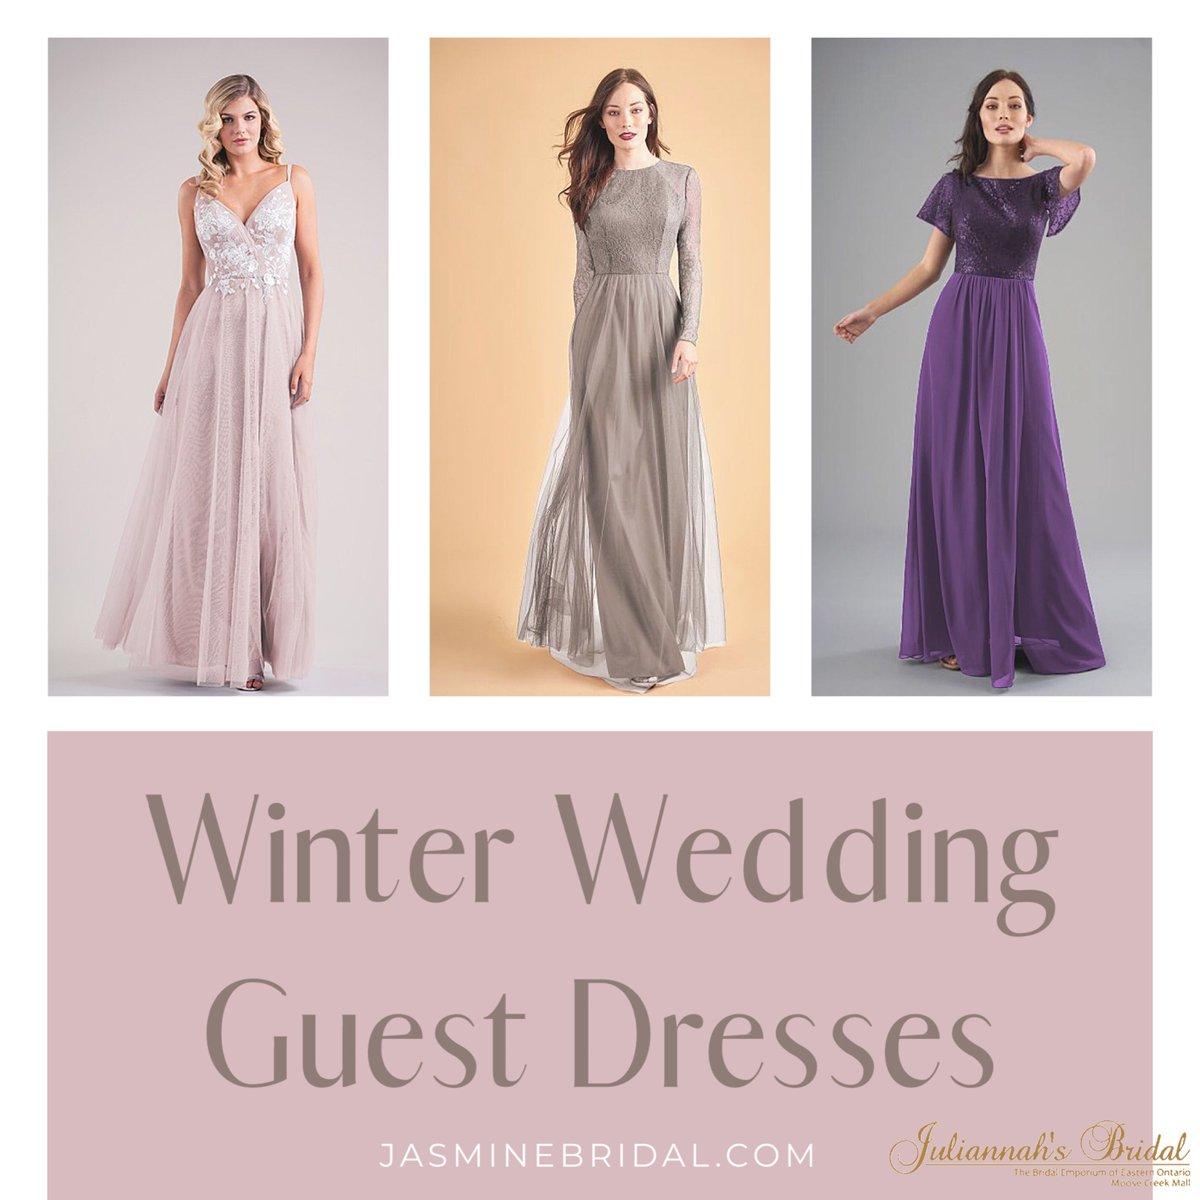 Still trying to find something to wear to an upcoming wedding? Jasmine Bridal has some fabulous suggestions!    #juliannahsbridal #bridalshop #weddingdress #wedding #ido #love #bridalboutique